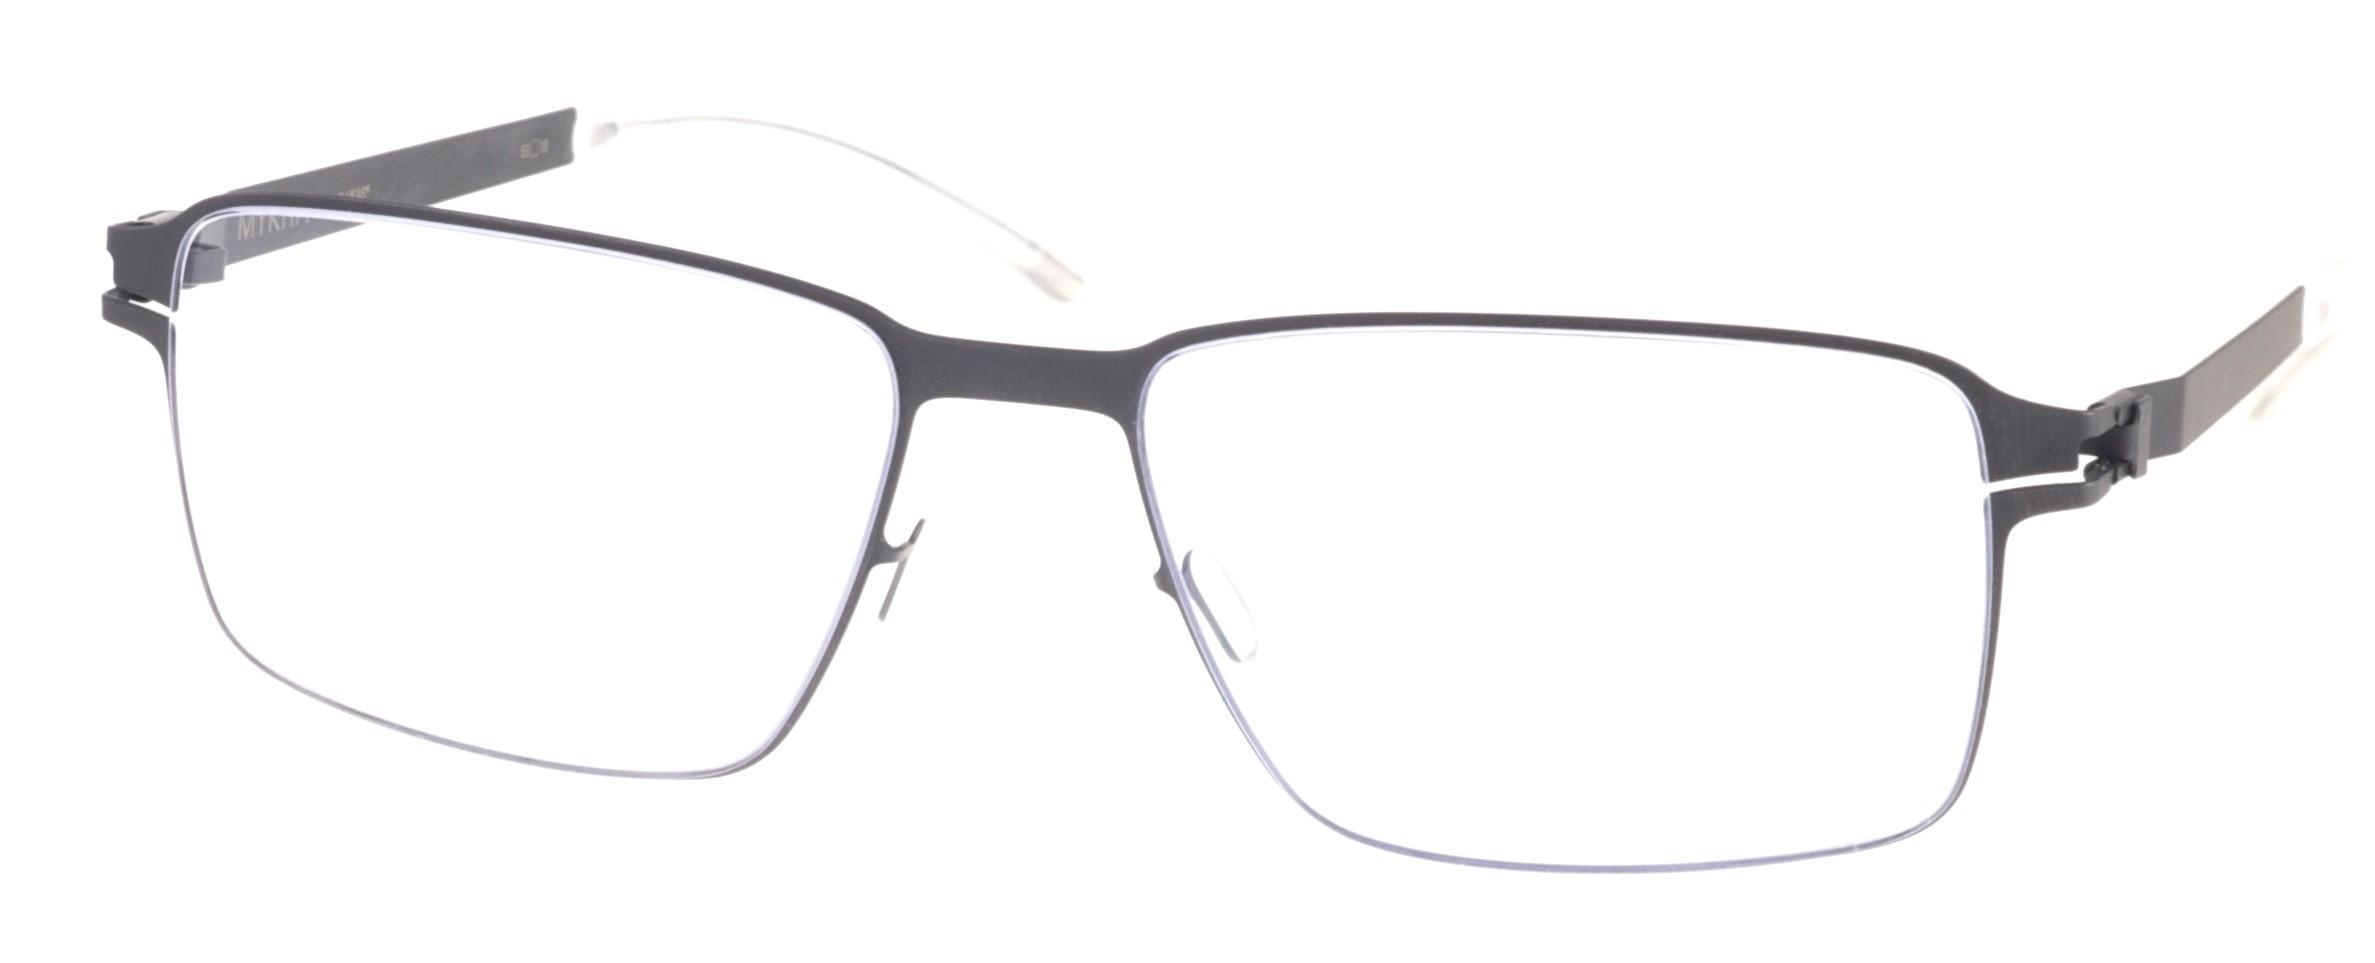 Mykita Online | Mykita Usa | Mykita Glasses